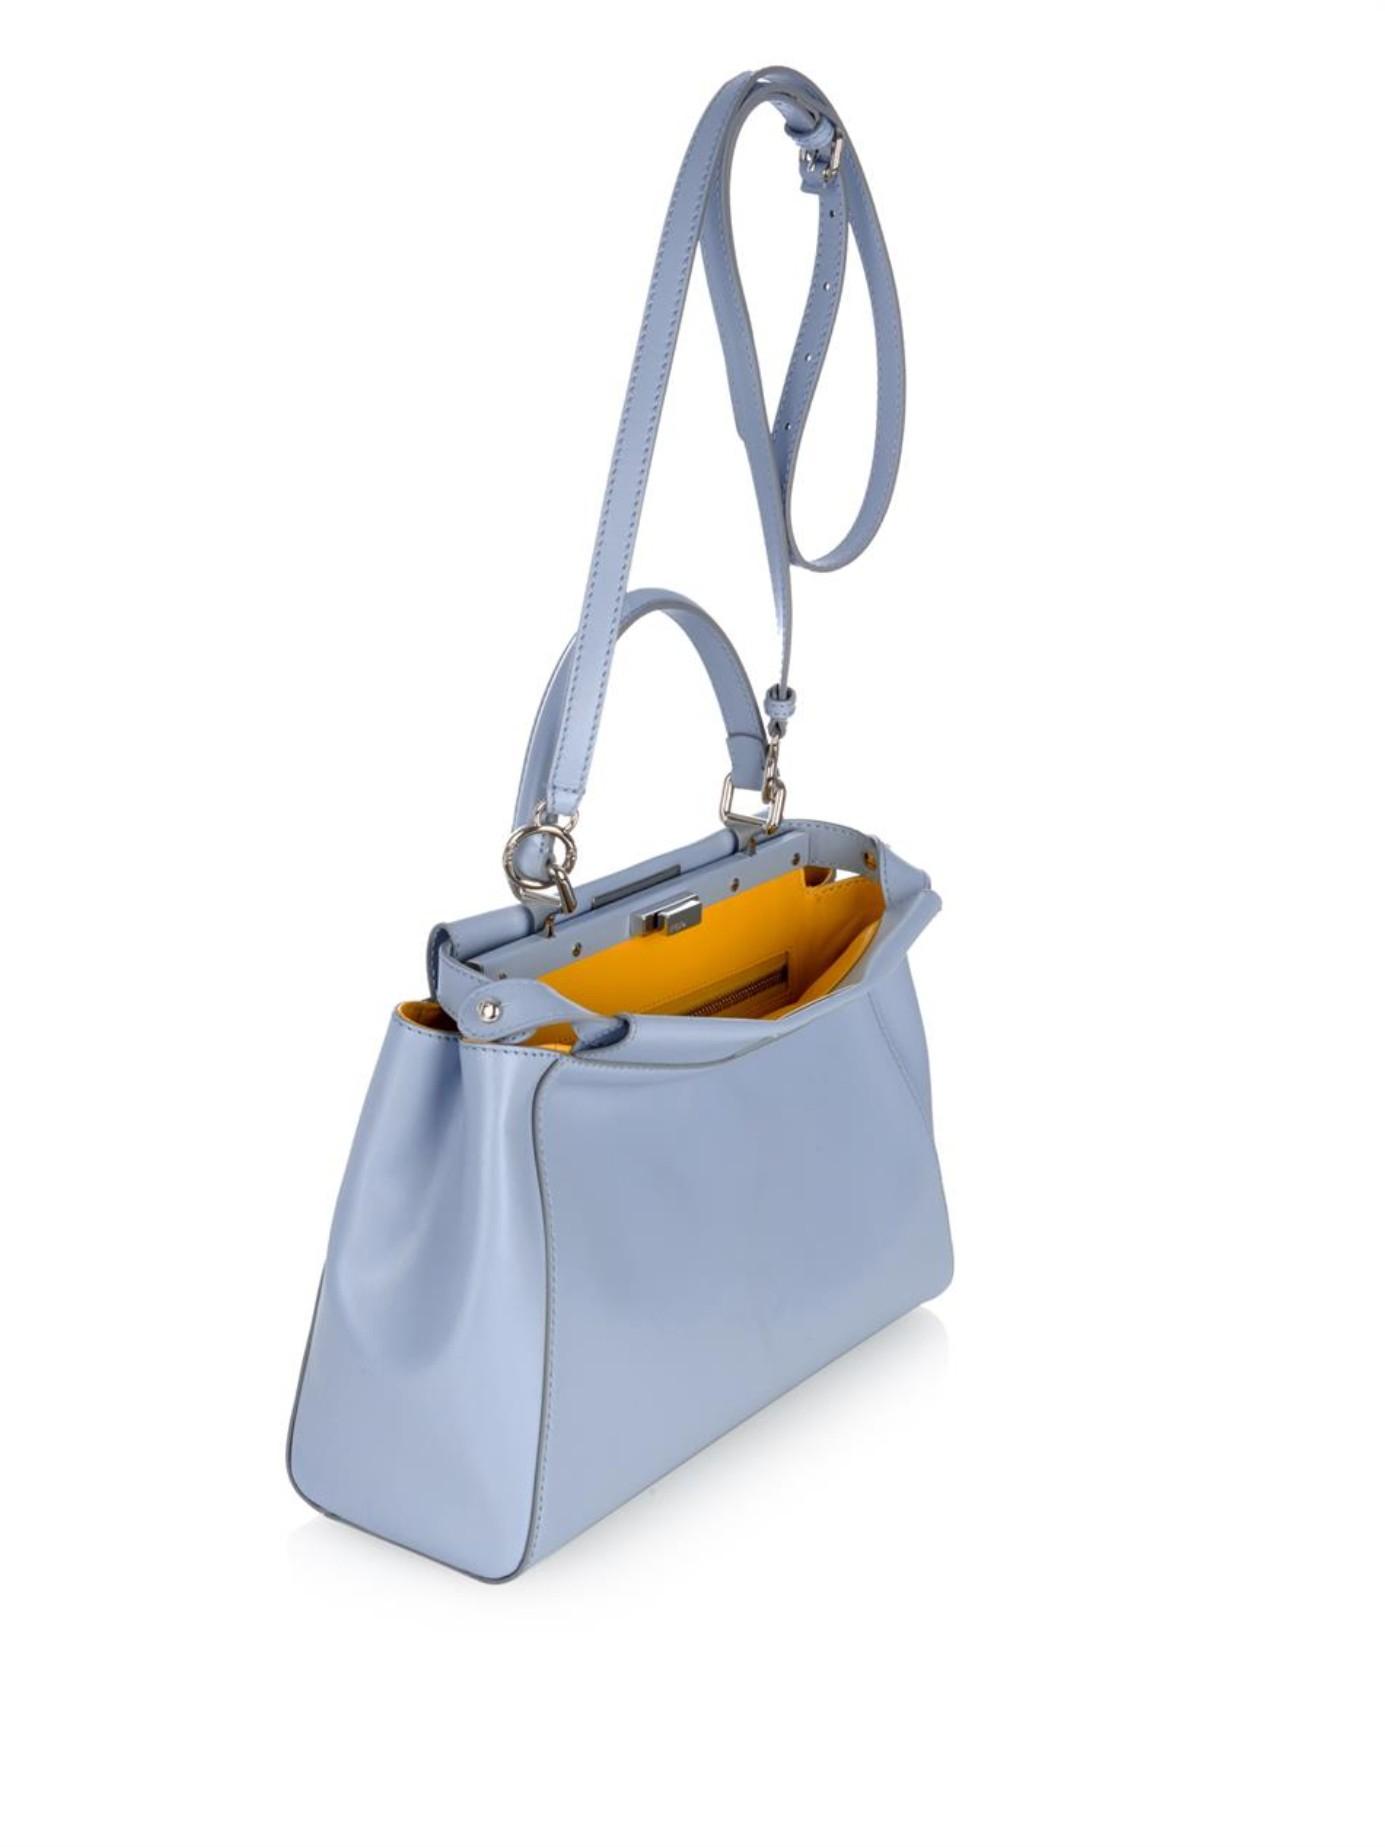 ... ebay fendi peekaboo leather tote in blue lyst a06f2 5bcd2 cc868e81b19b1